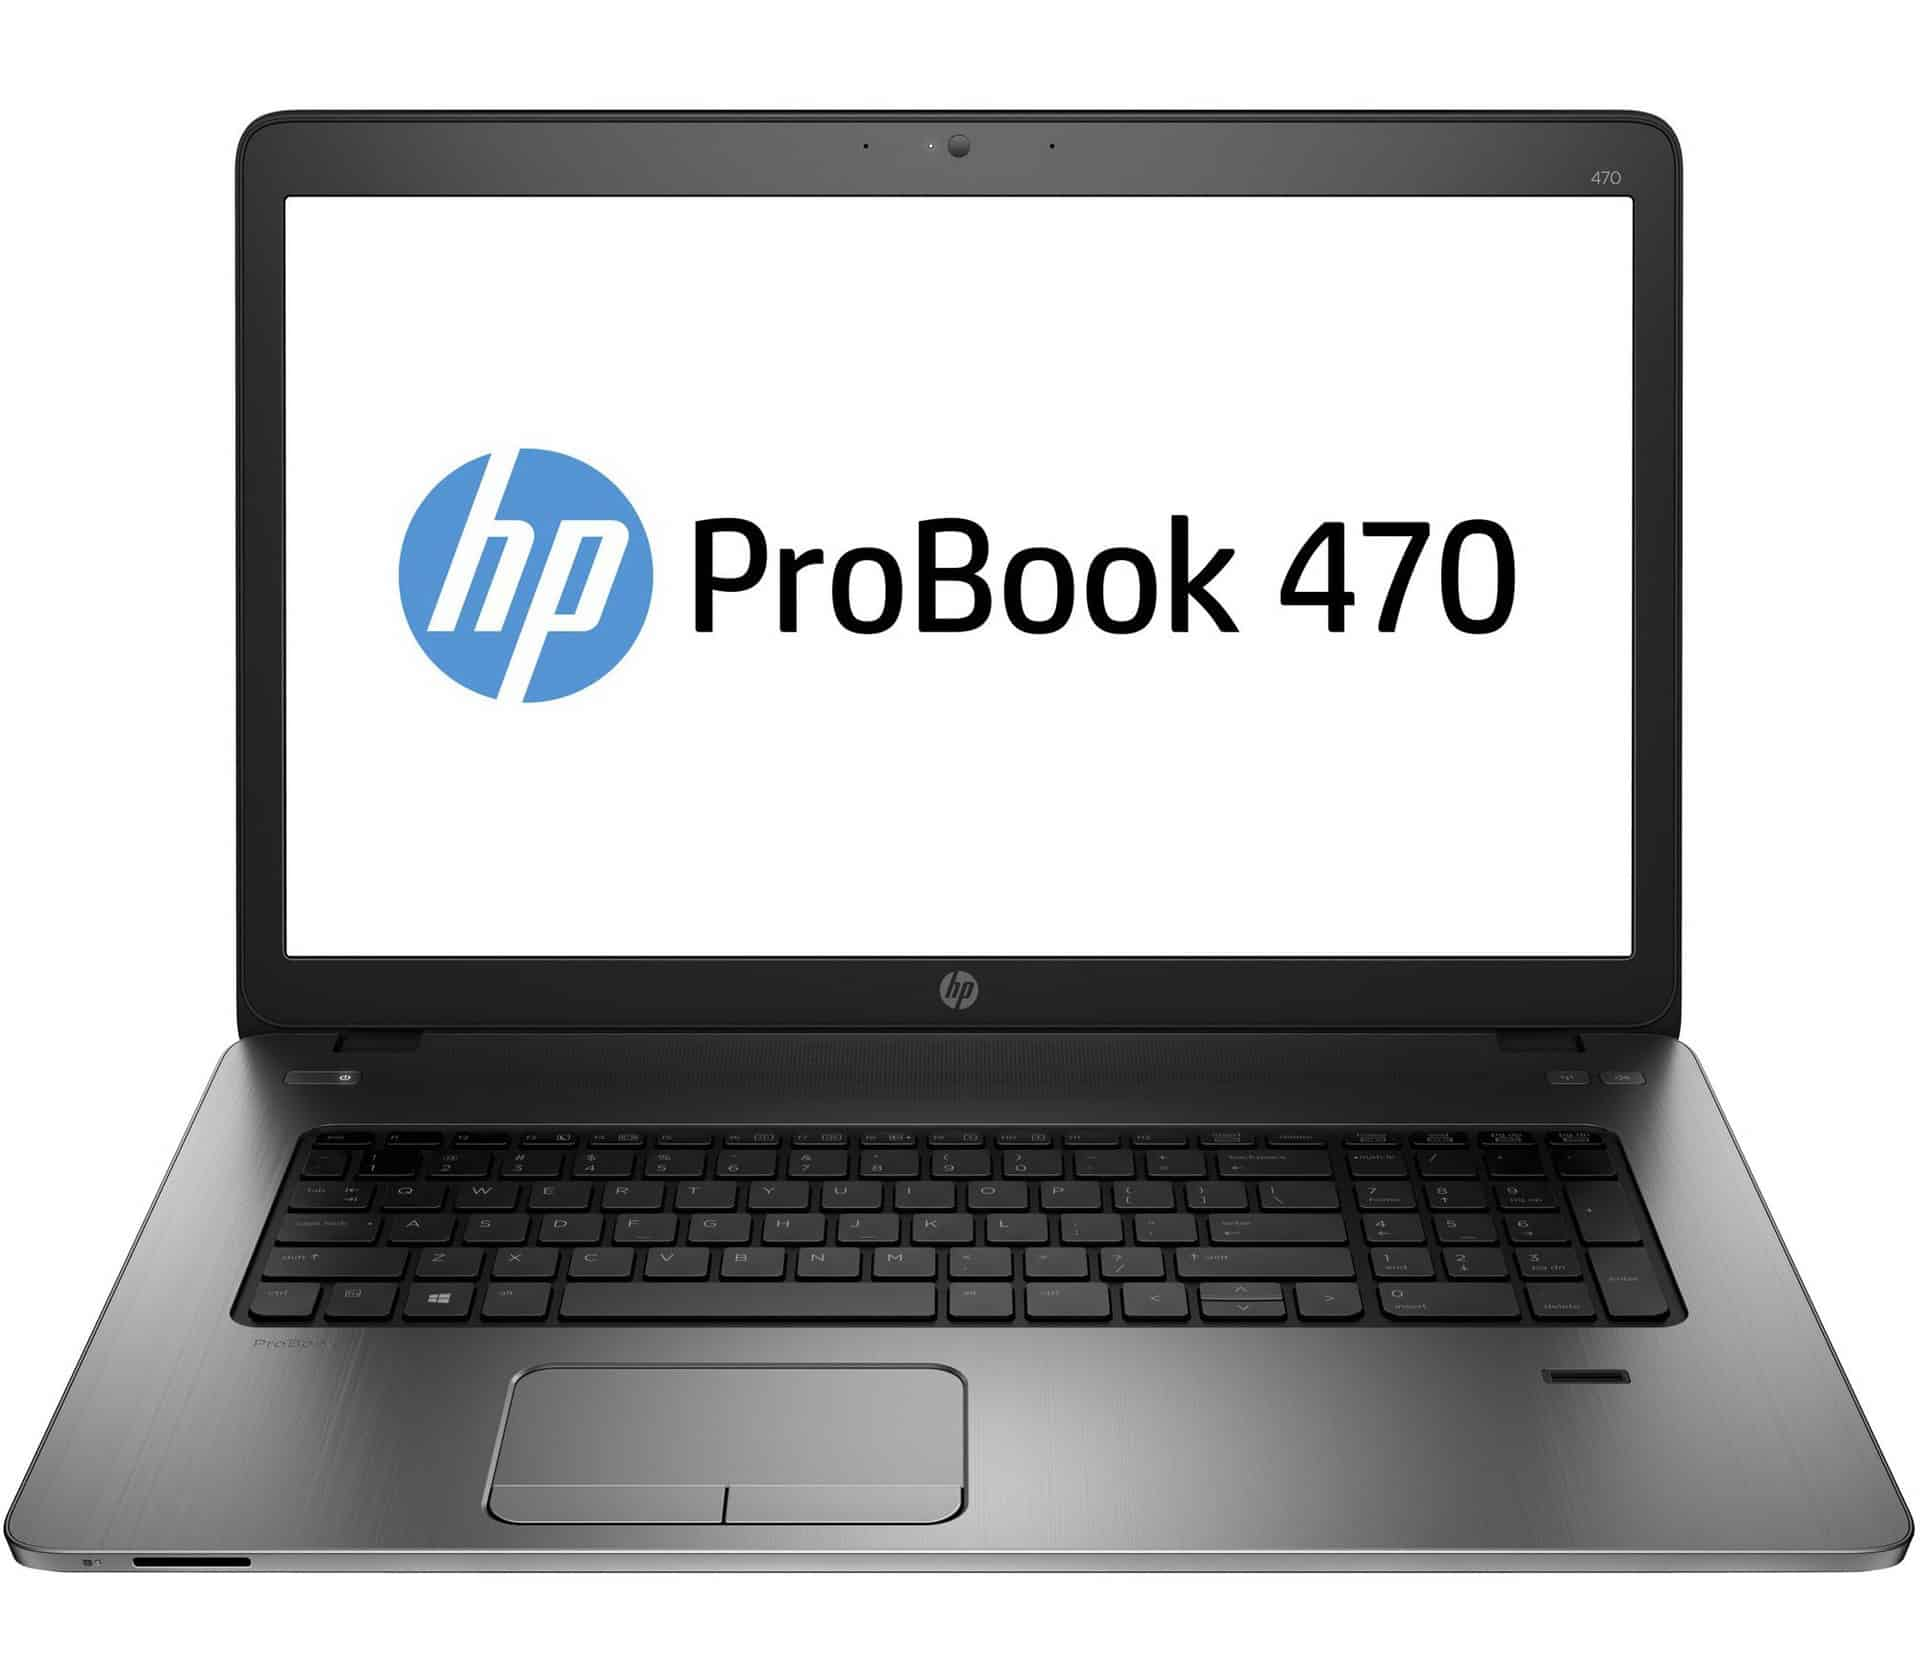 HP ProBook 470 G2 - Laptop mare cu productivitate crescuta!